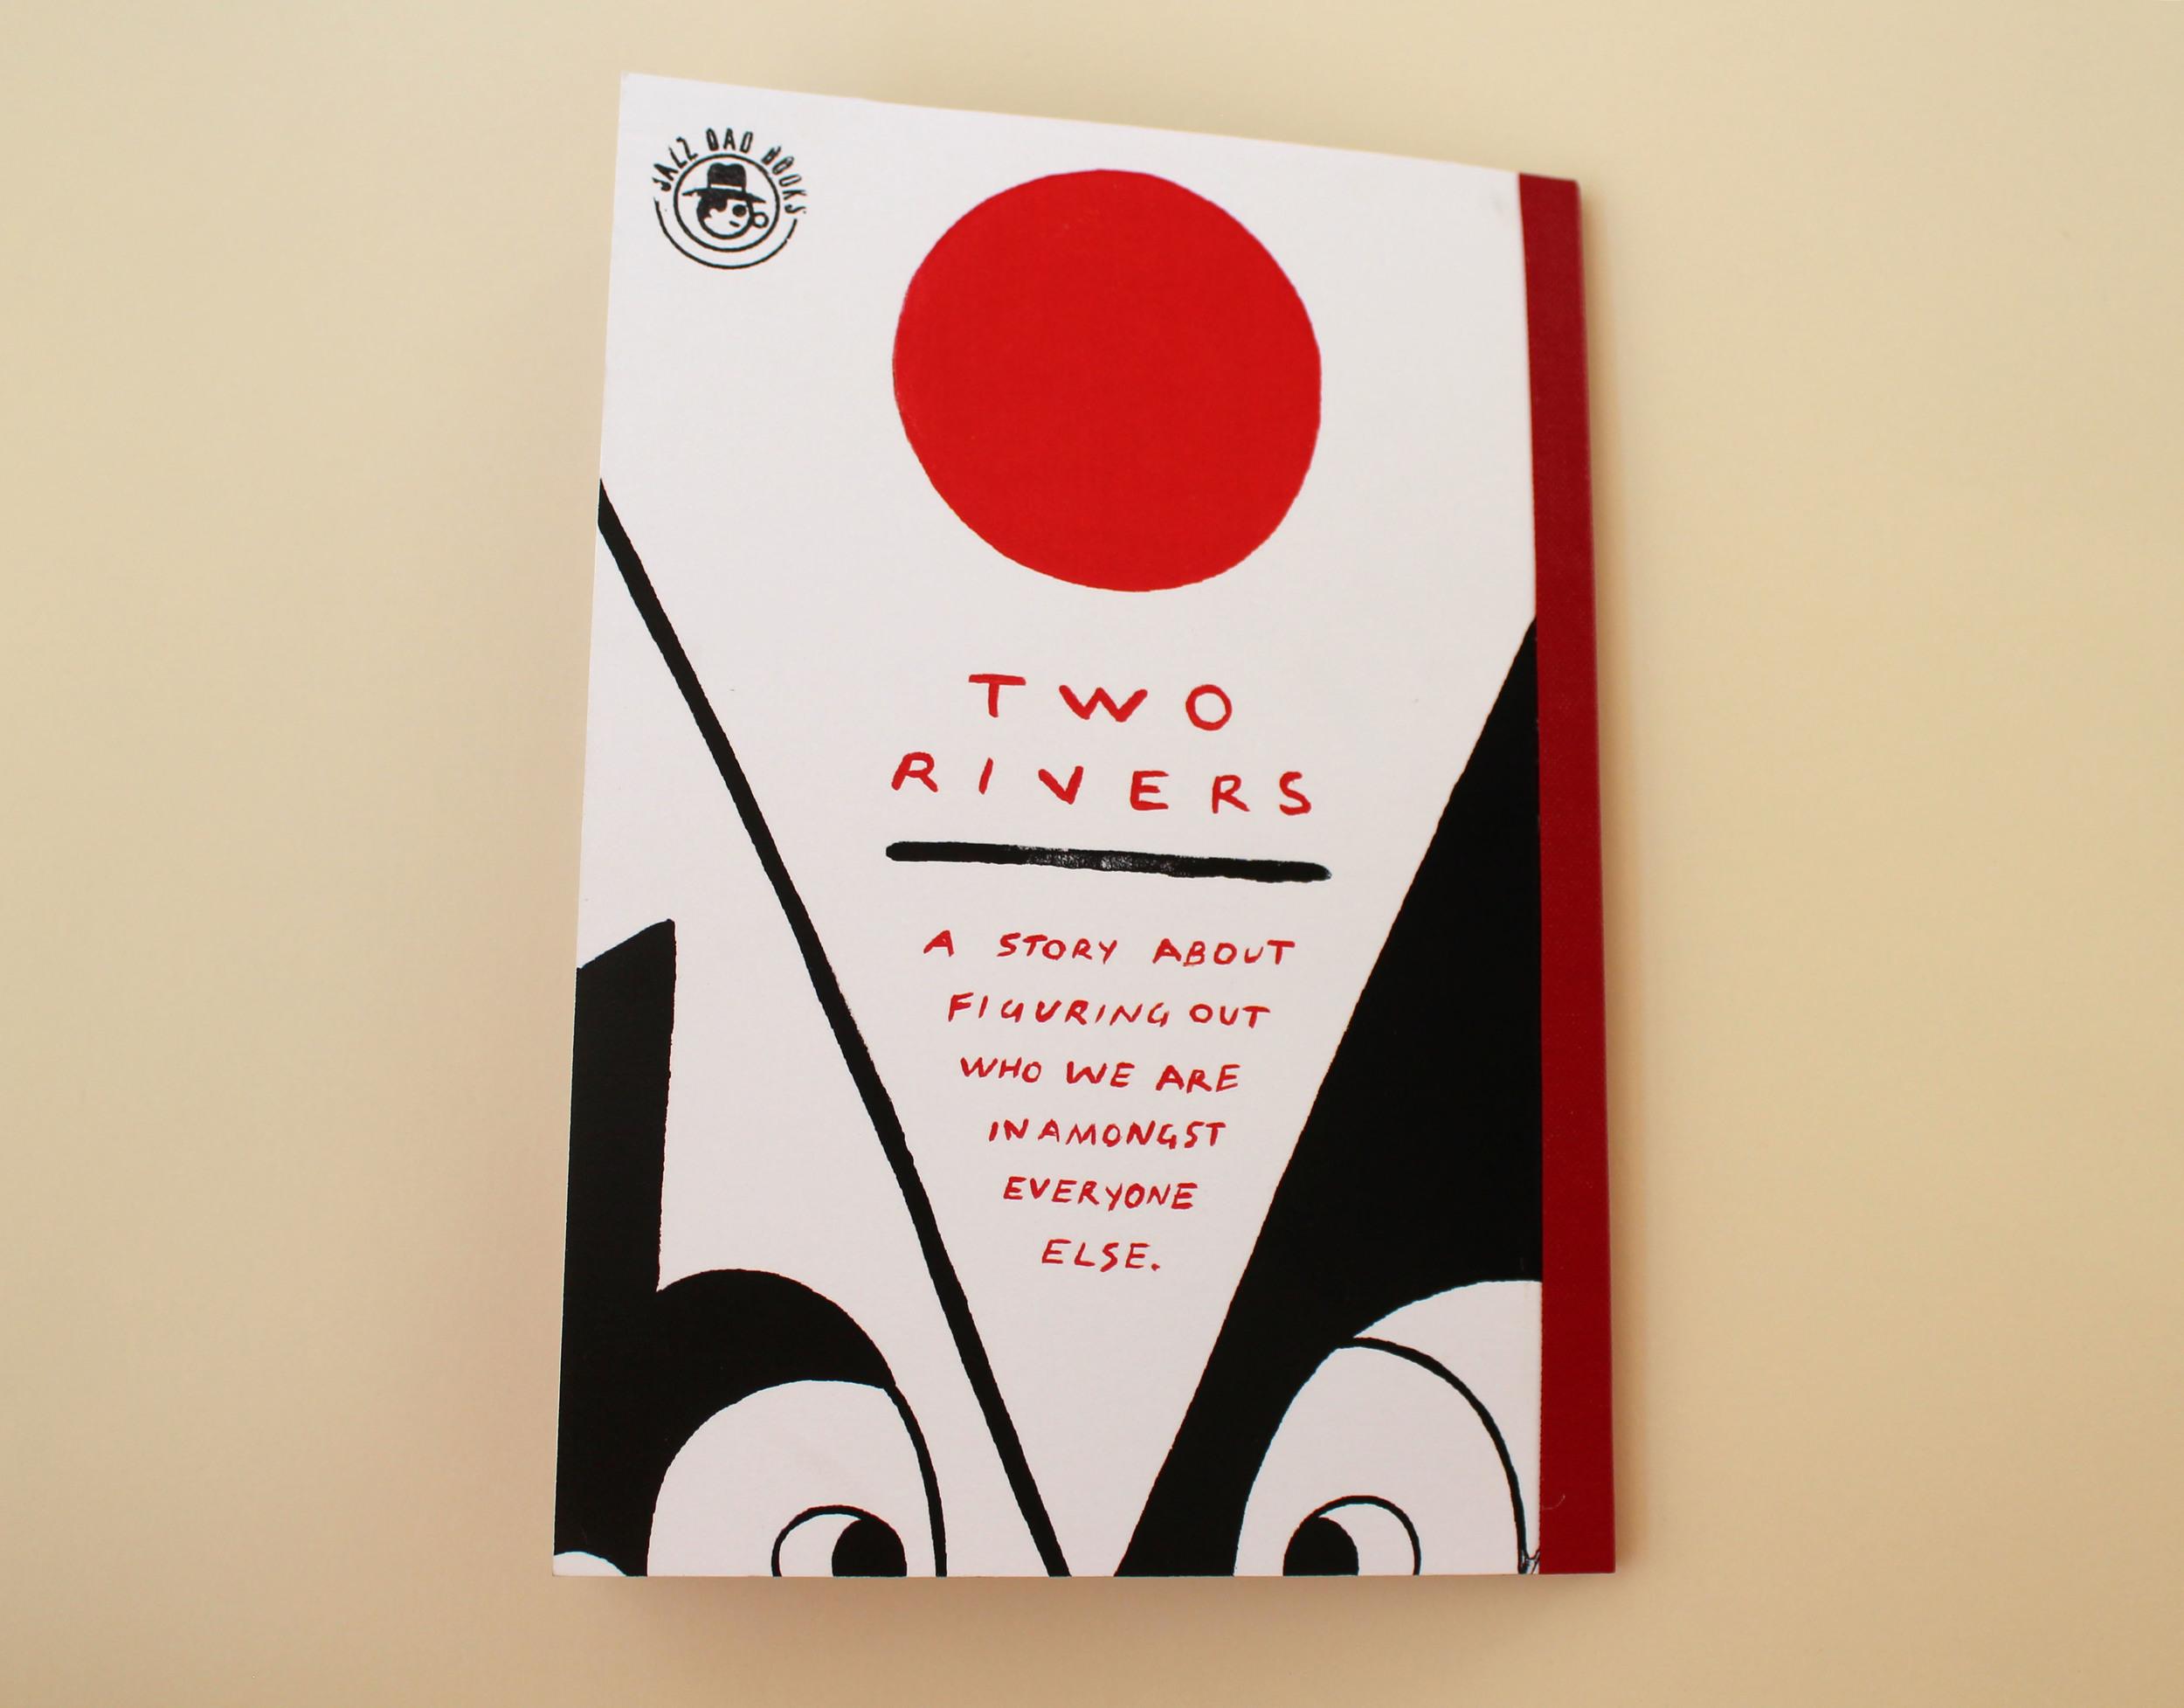 two rivers photo 001.jpg